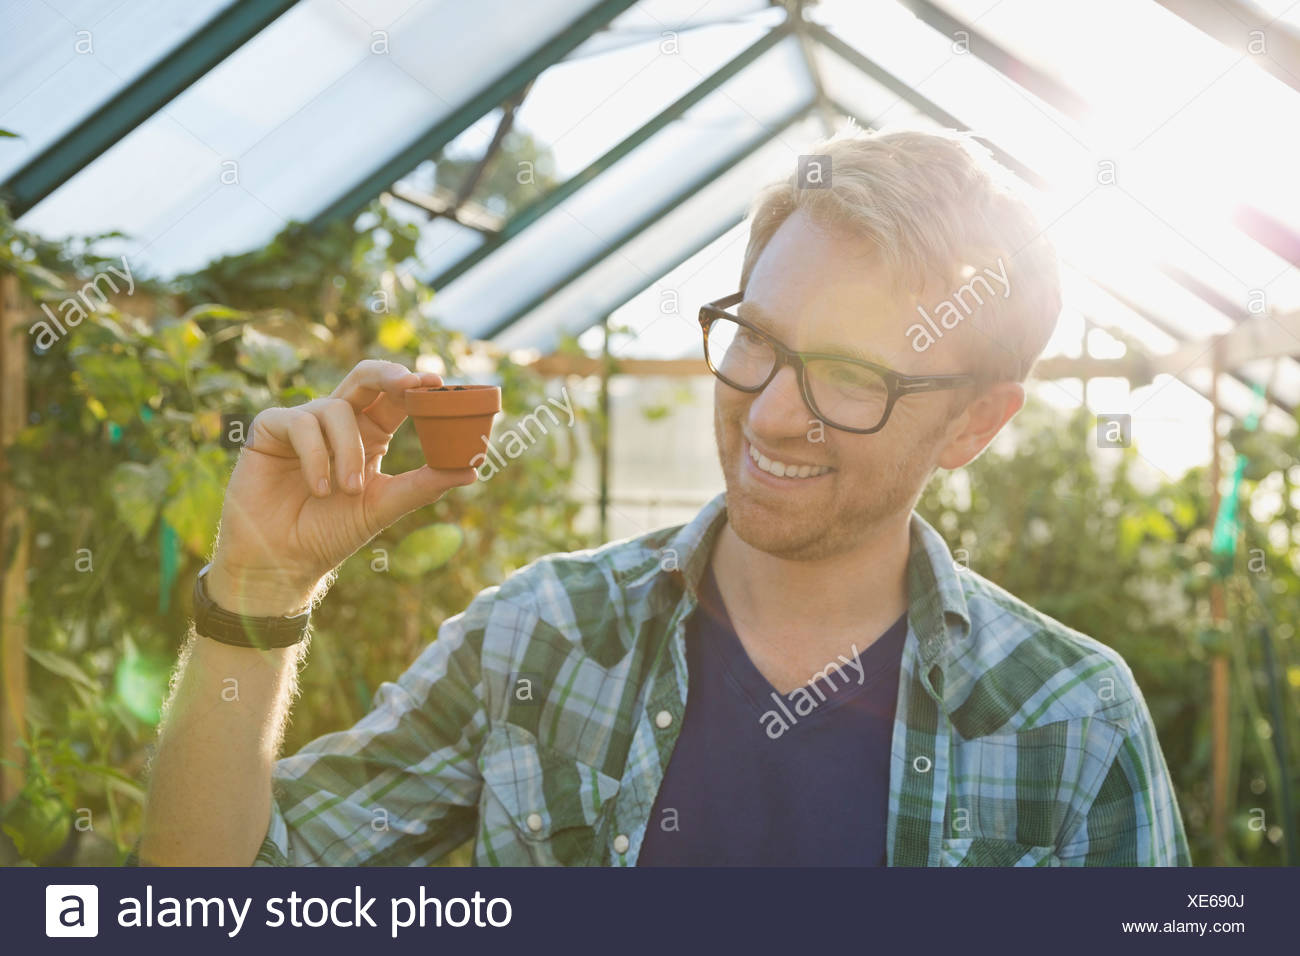 Smiling man holding tiny pot dans les émissions Photo Stock